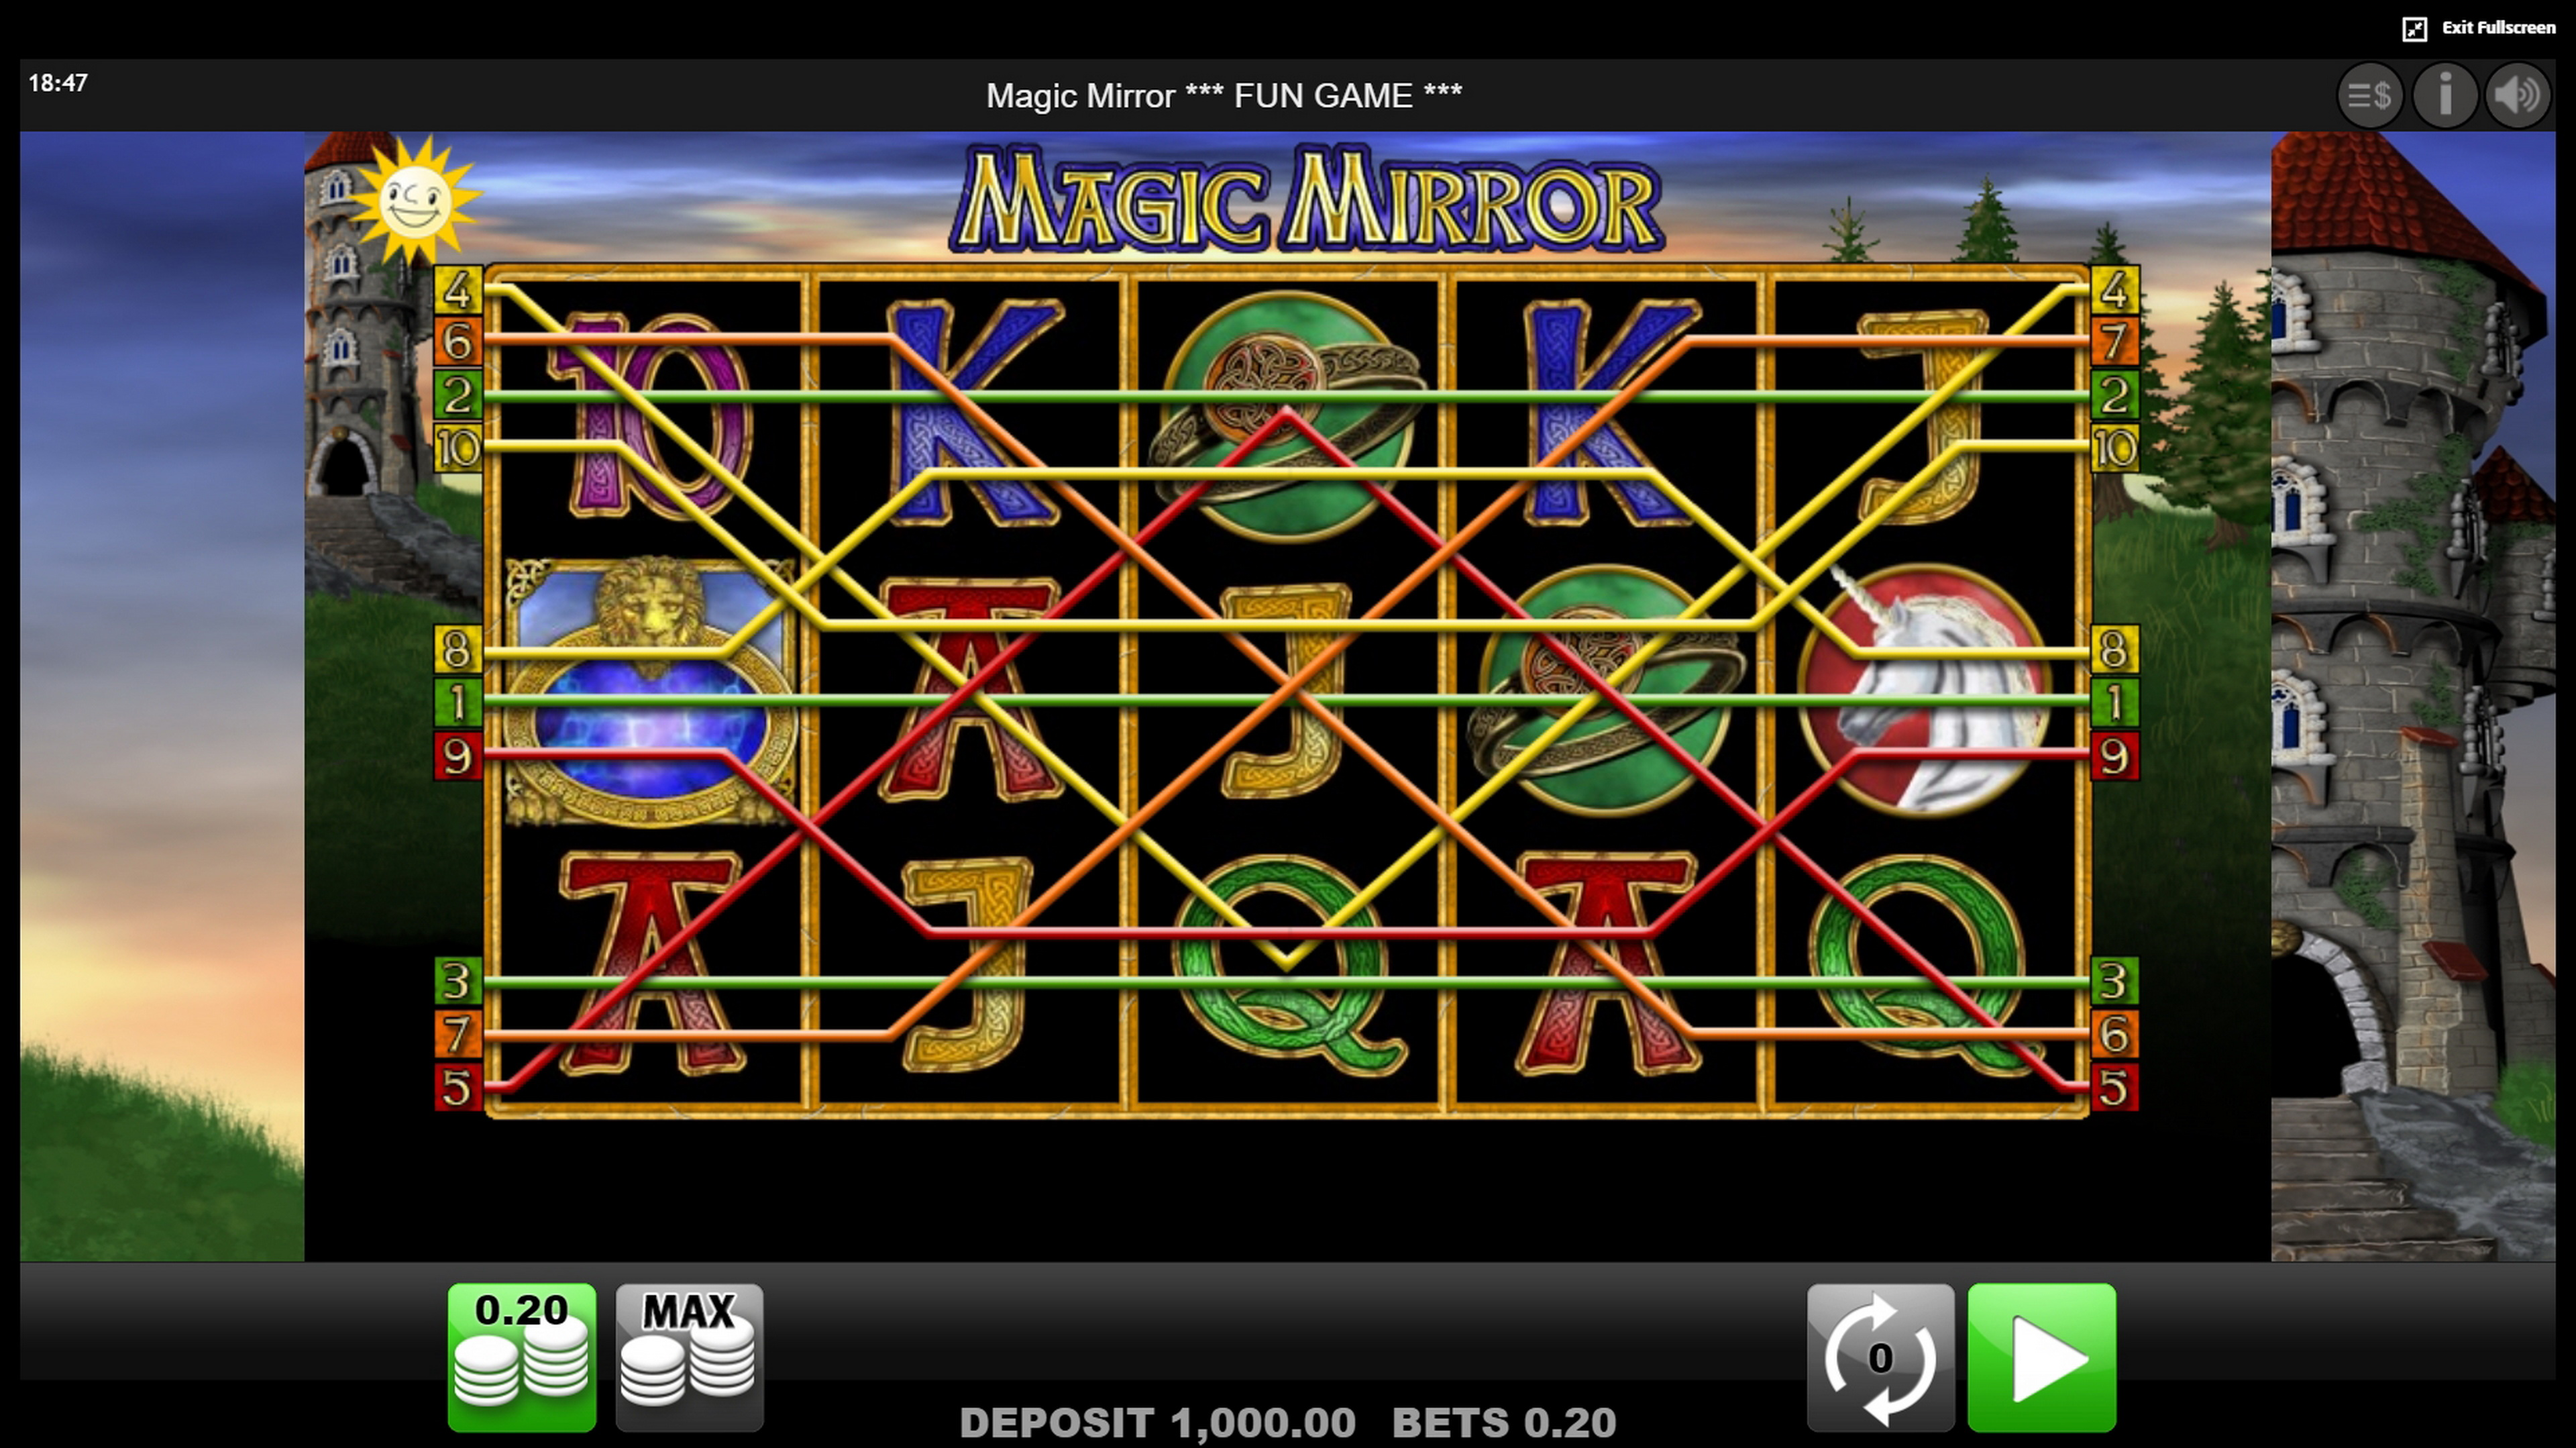 Magic Mirror Slot Machine